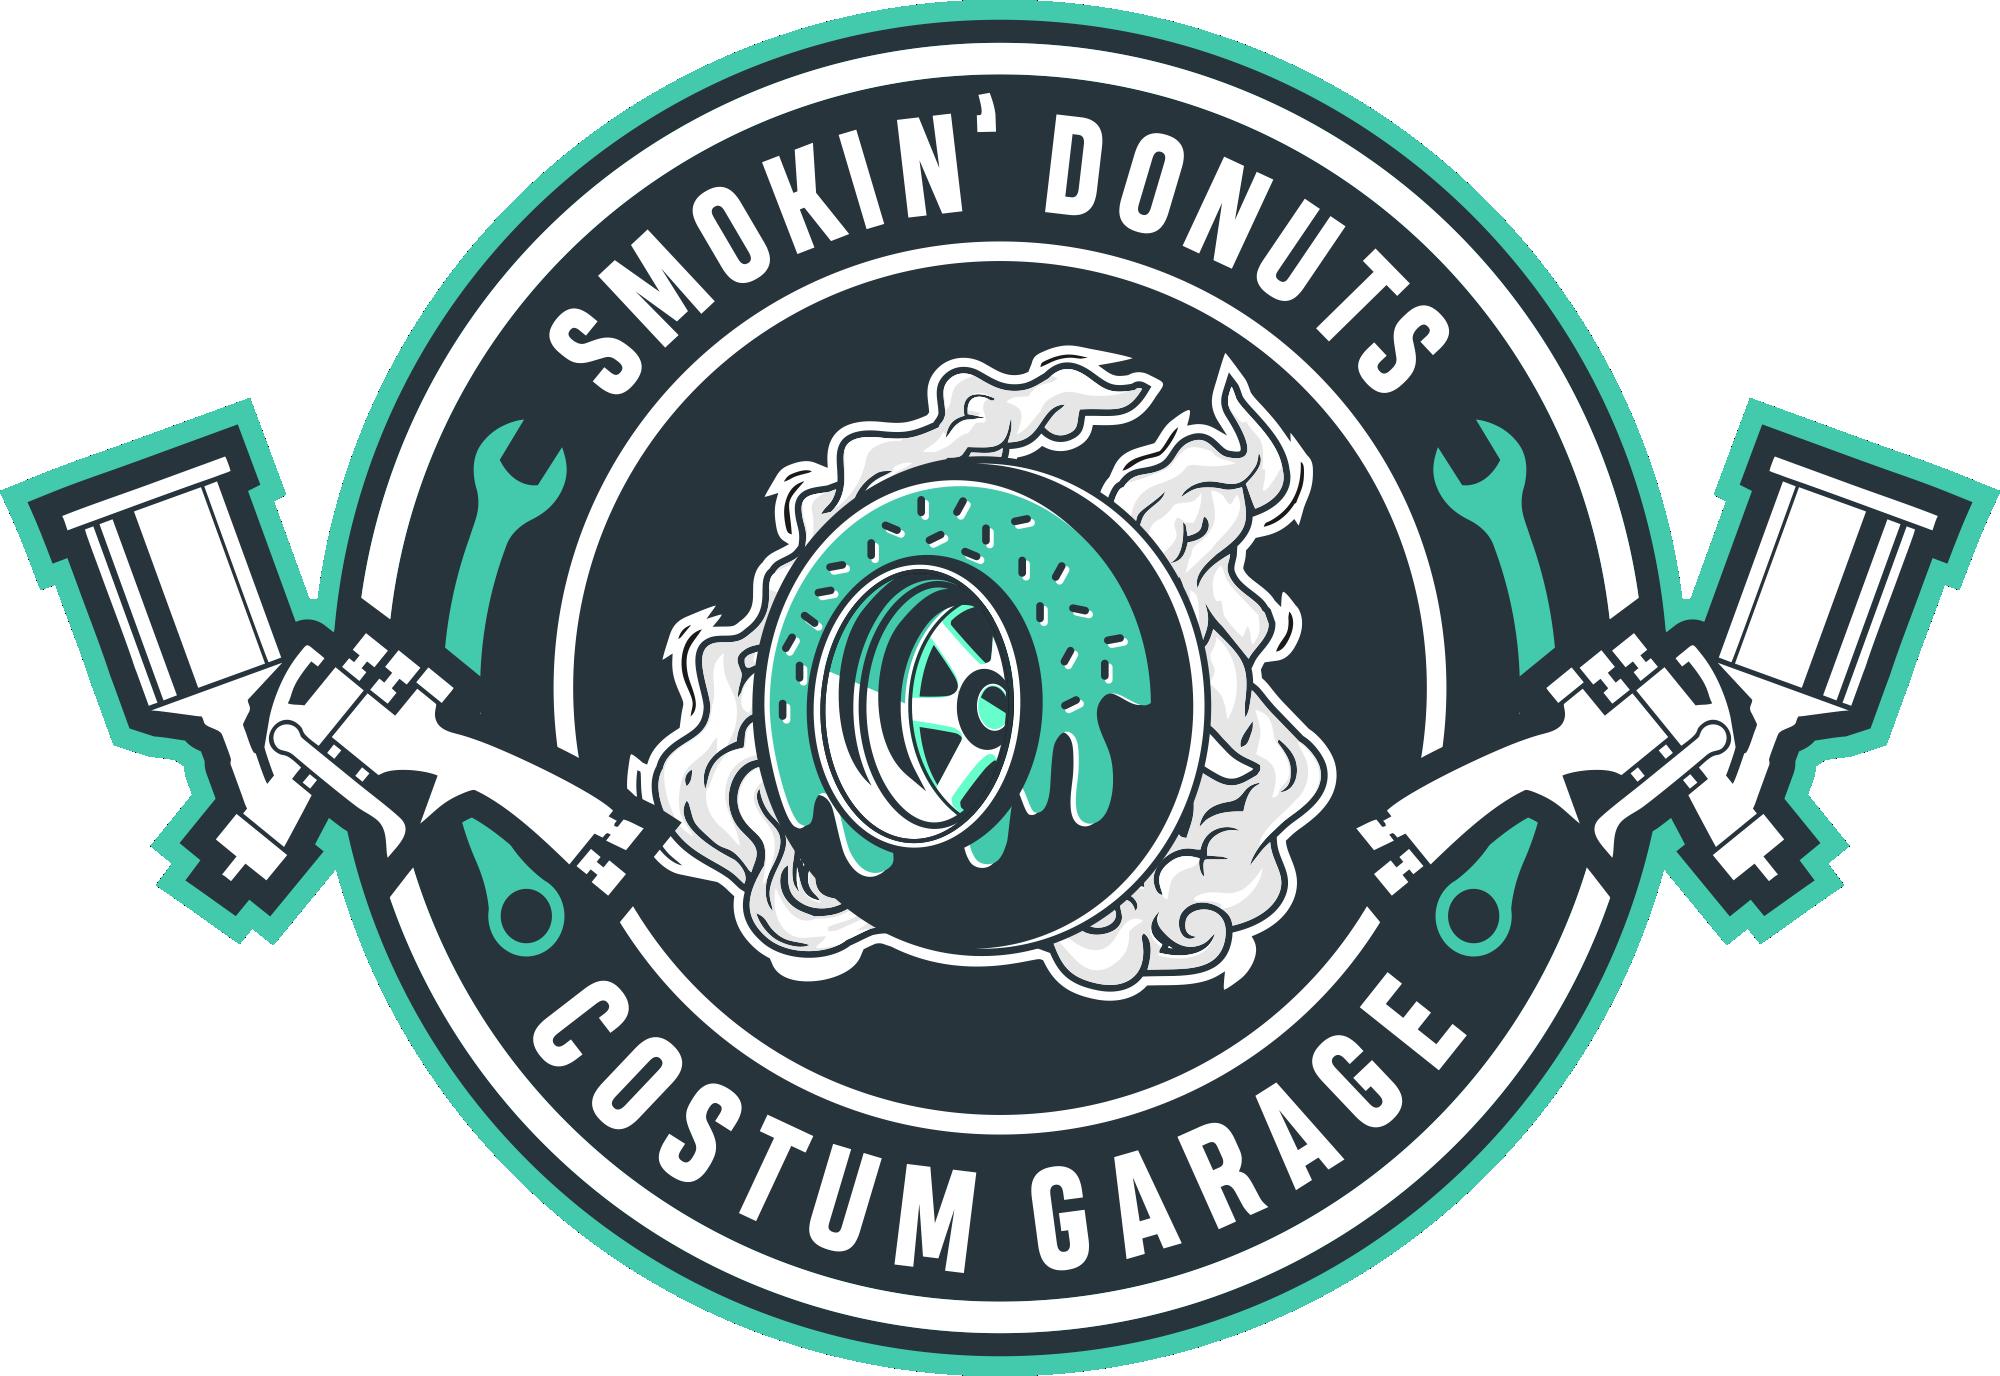 Smokin donuts  || Custom garage